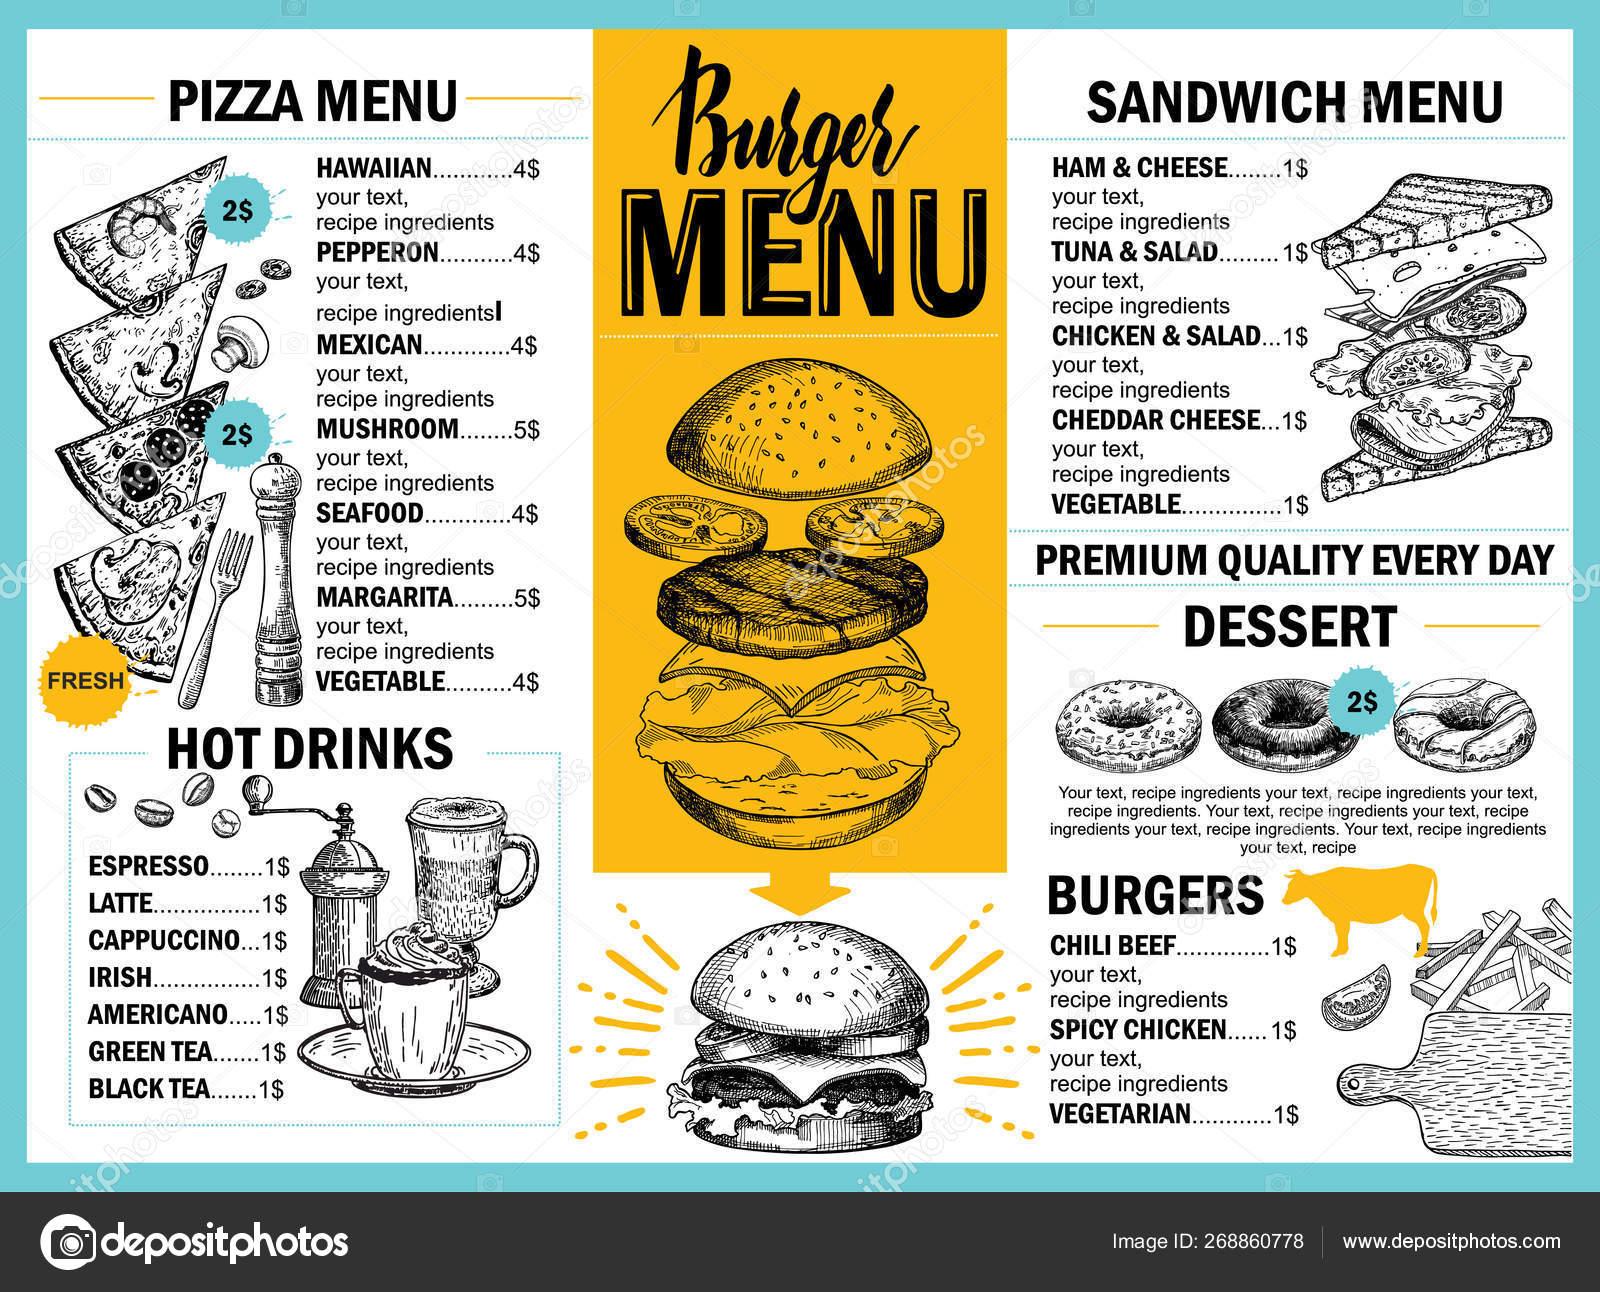 Food Menu Restaurant Cafe Design Template Hand Drawn Graphic Elements Stock Vector C Luisvv 268860778